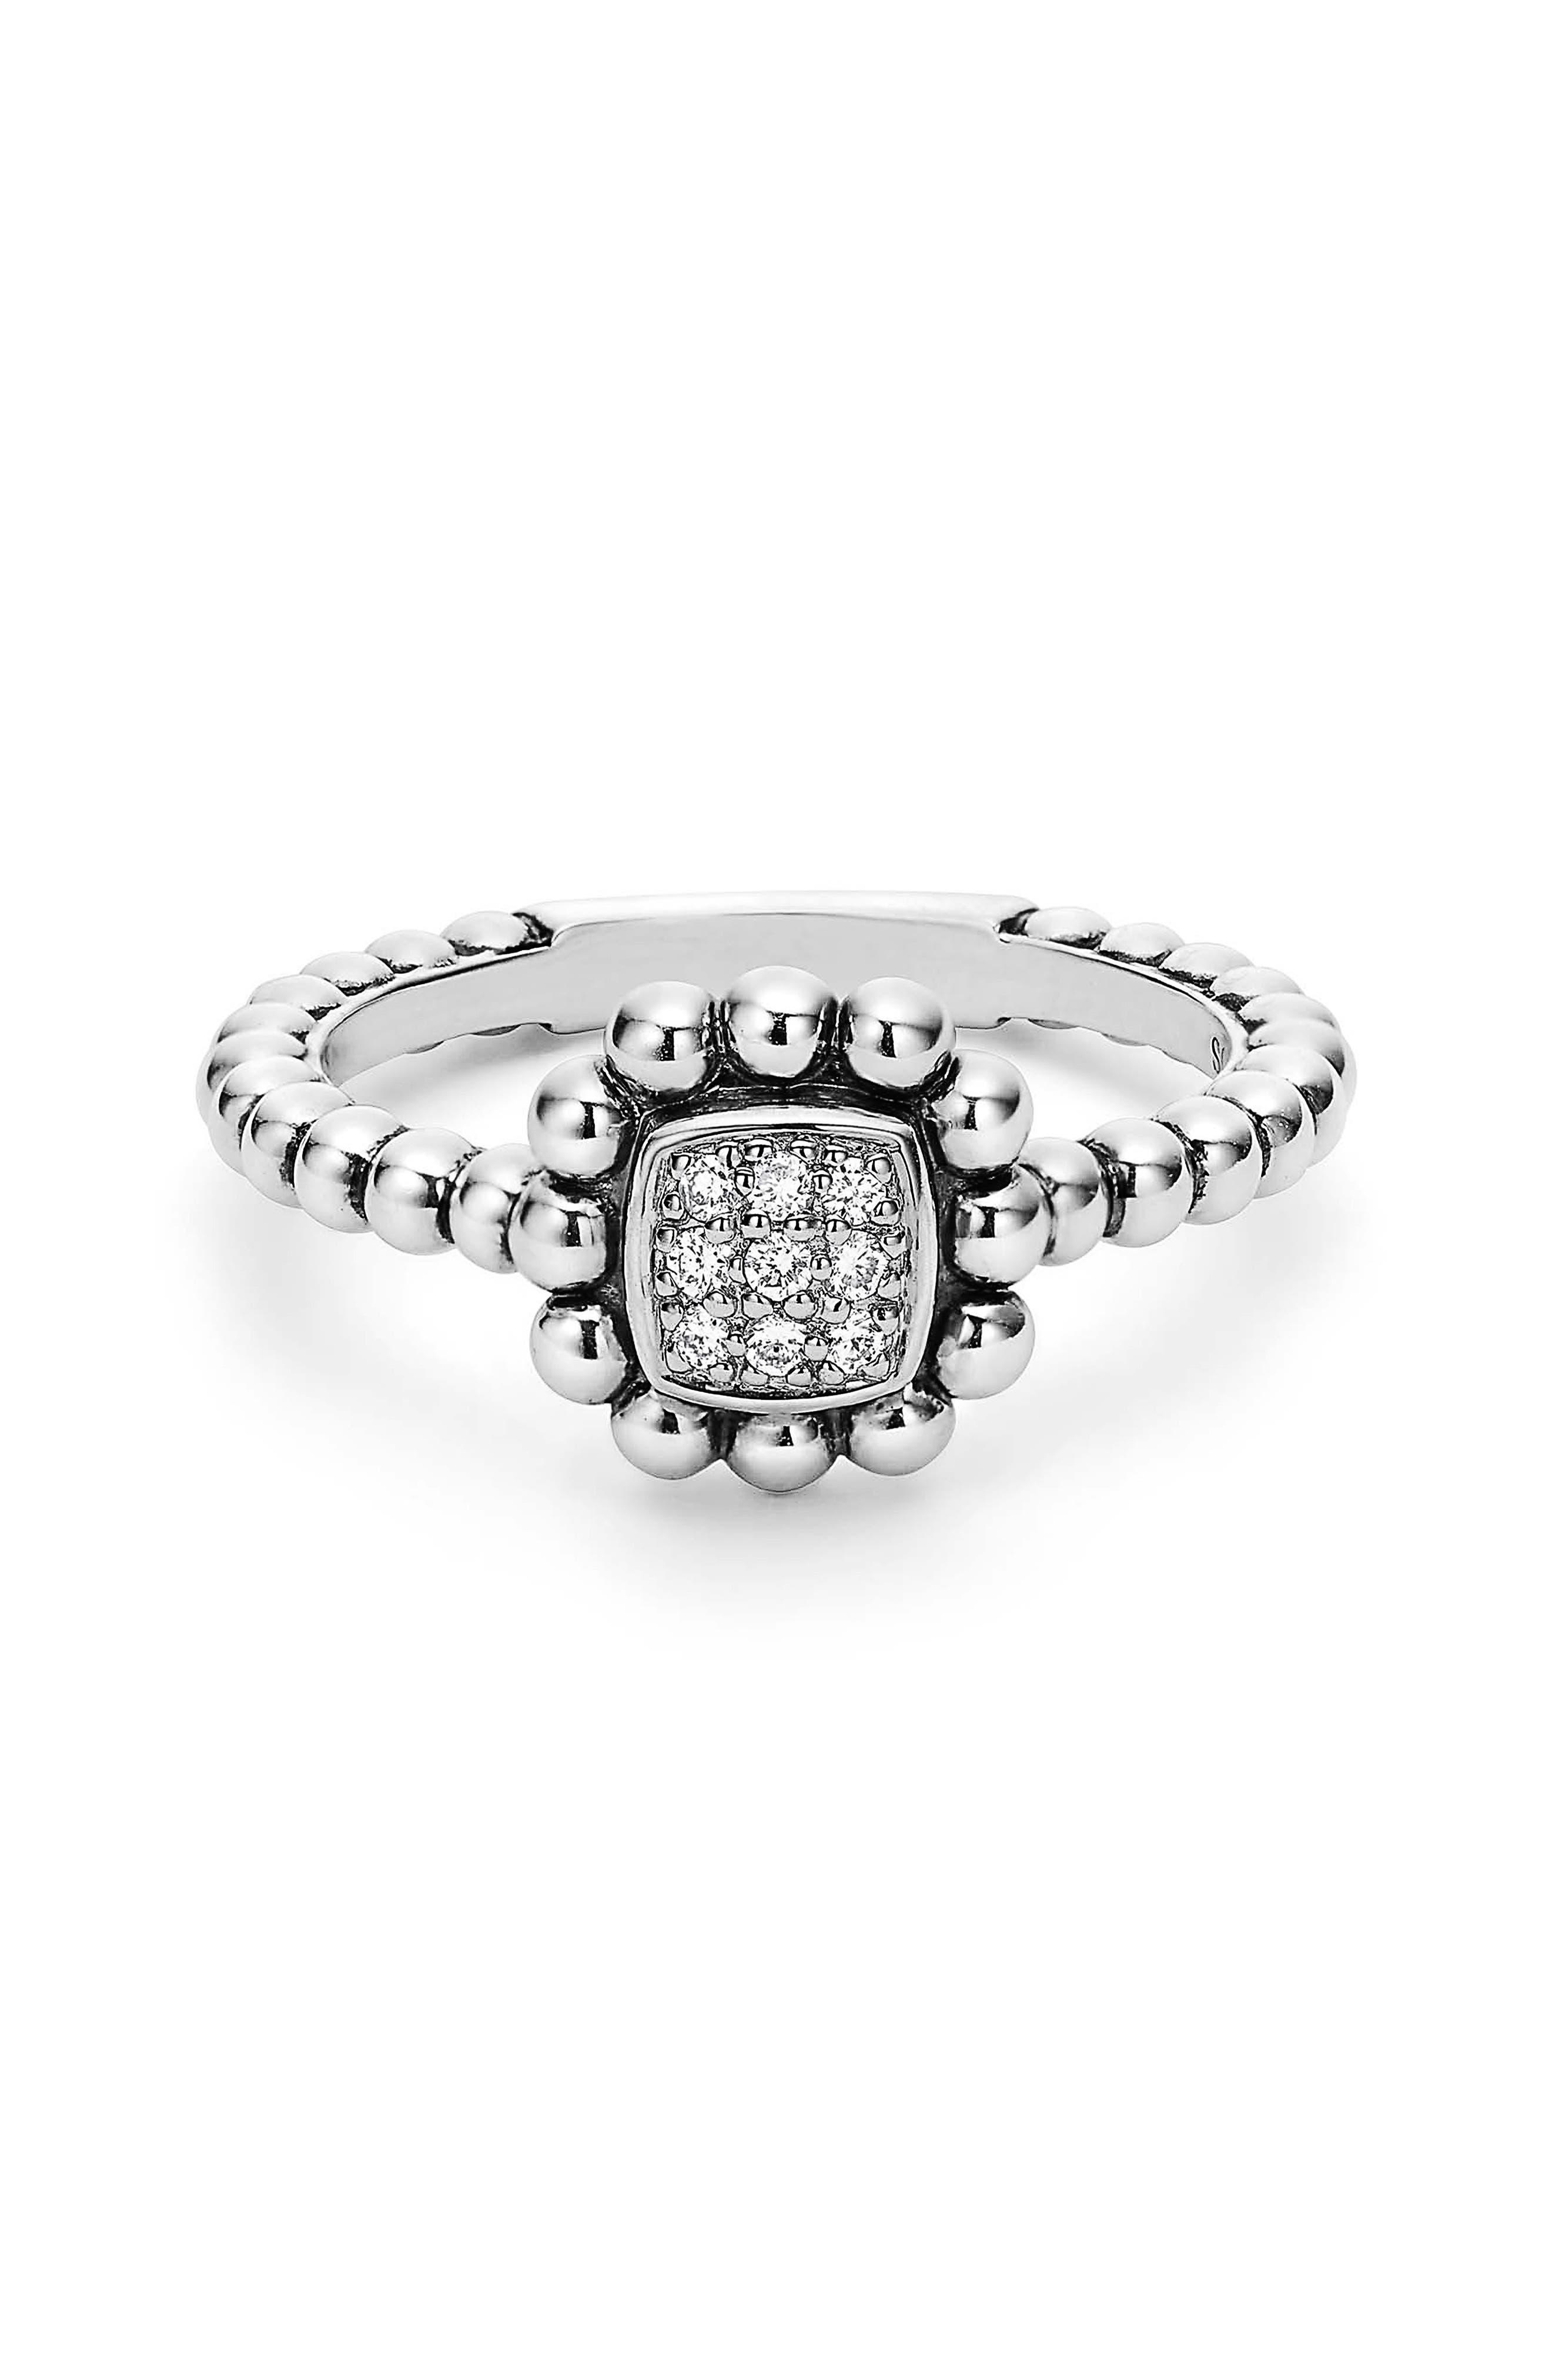 Caviar Spark Diamond Square Ring,                             Alternate thumbnail 3, color,                             SILVER/ DIAMOND